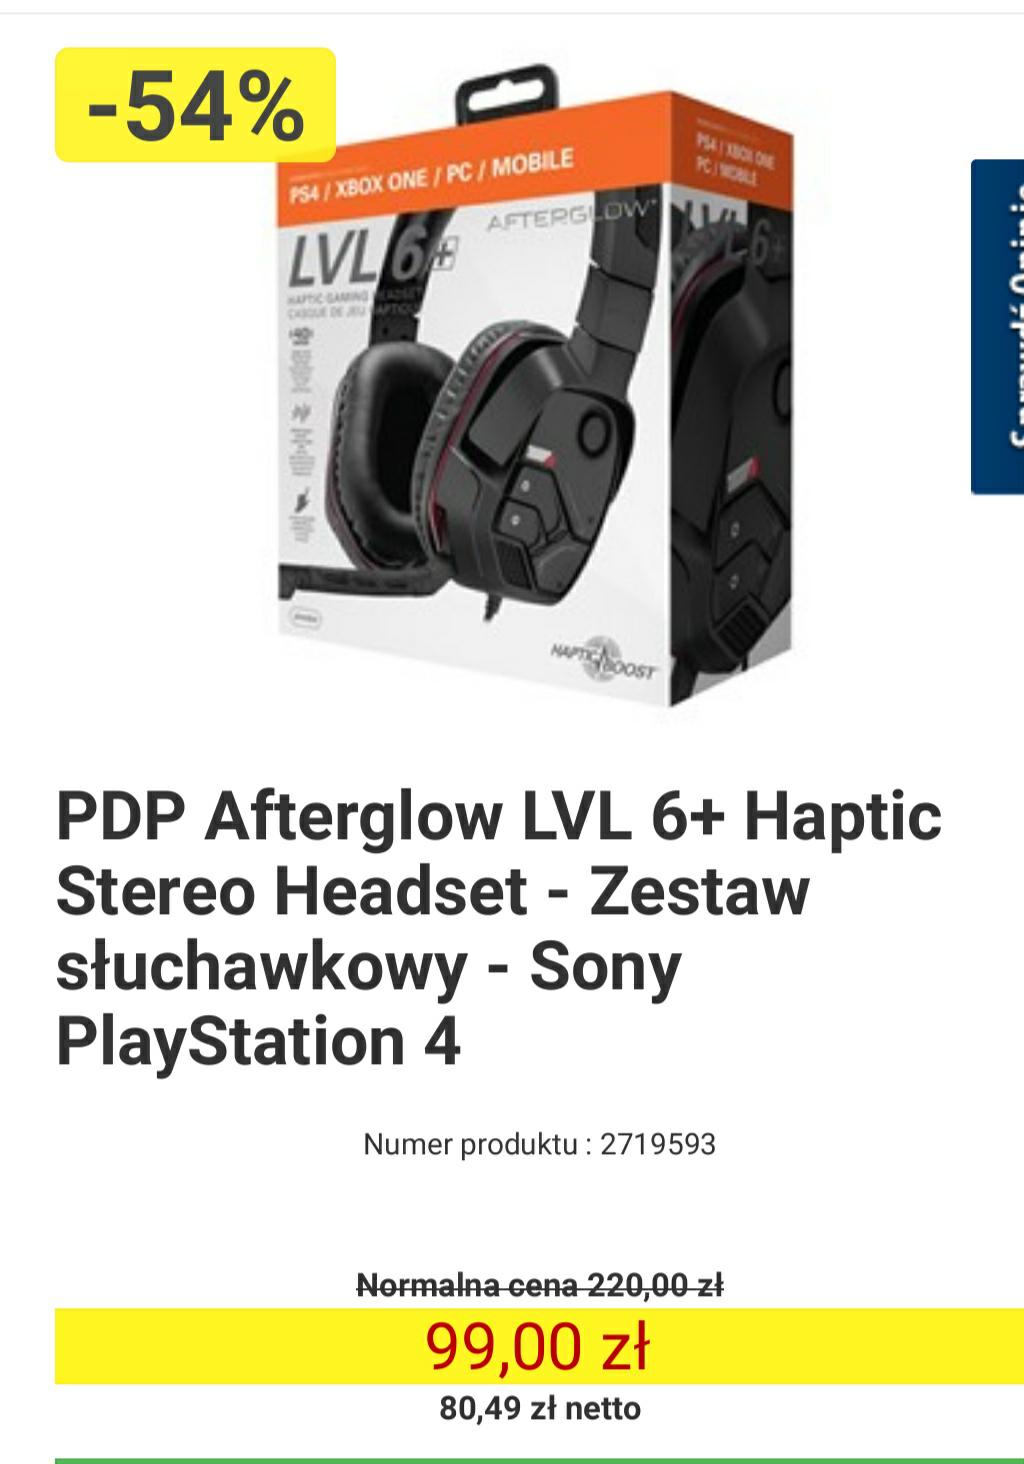 PDP Afterglow LVL 6+ Haptic Stereo Headset - Zestaw słuchawkowy